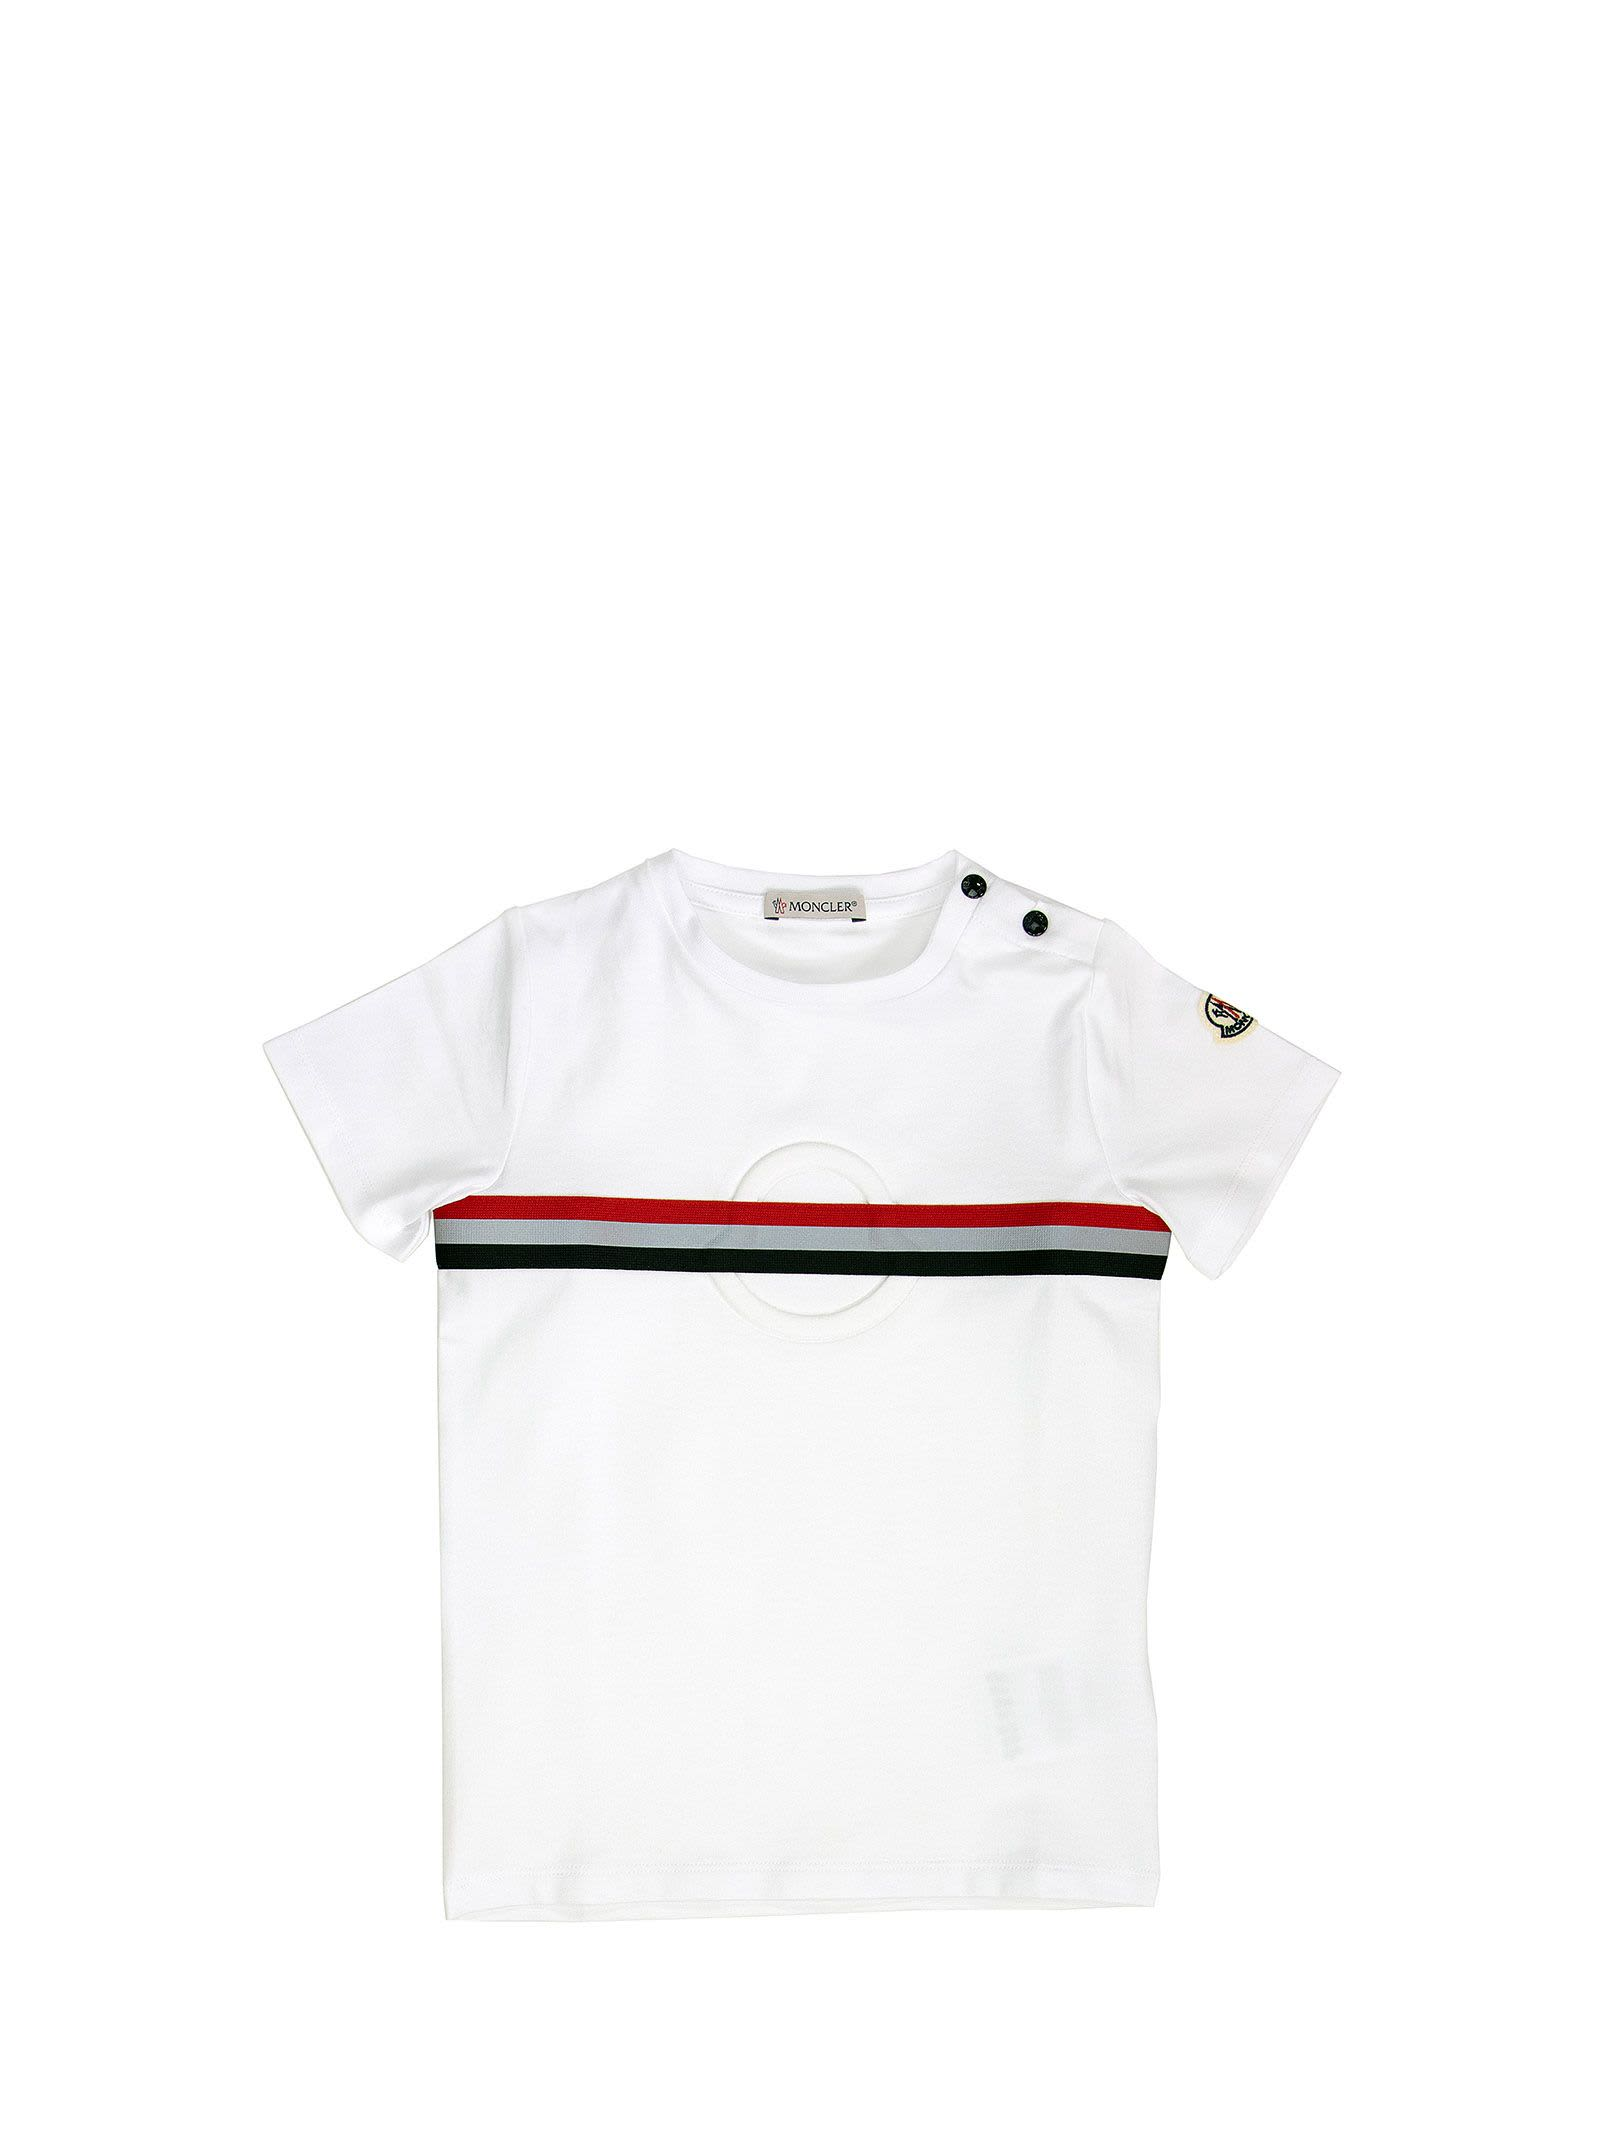 Moncler Cottons LOGO COTTON T-SHIRT WHITE